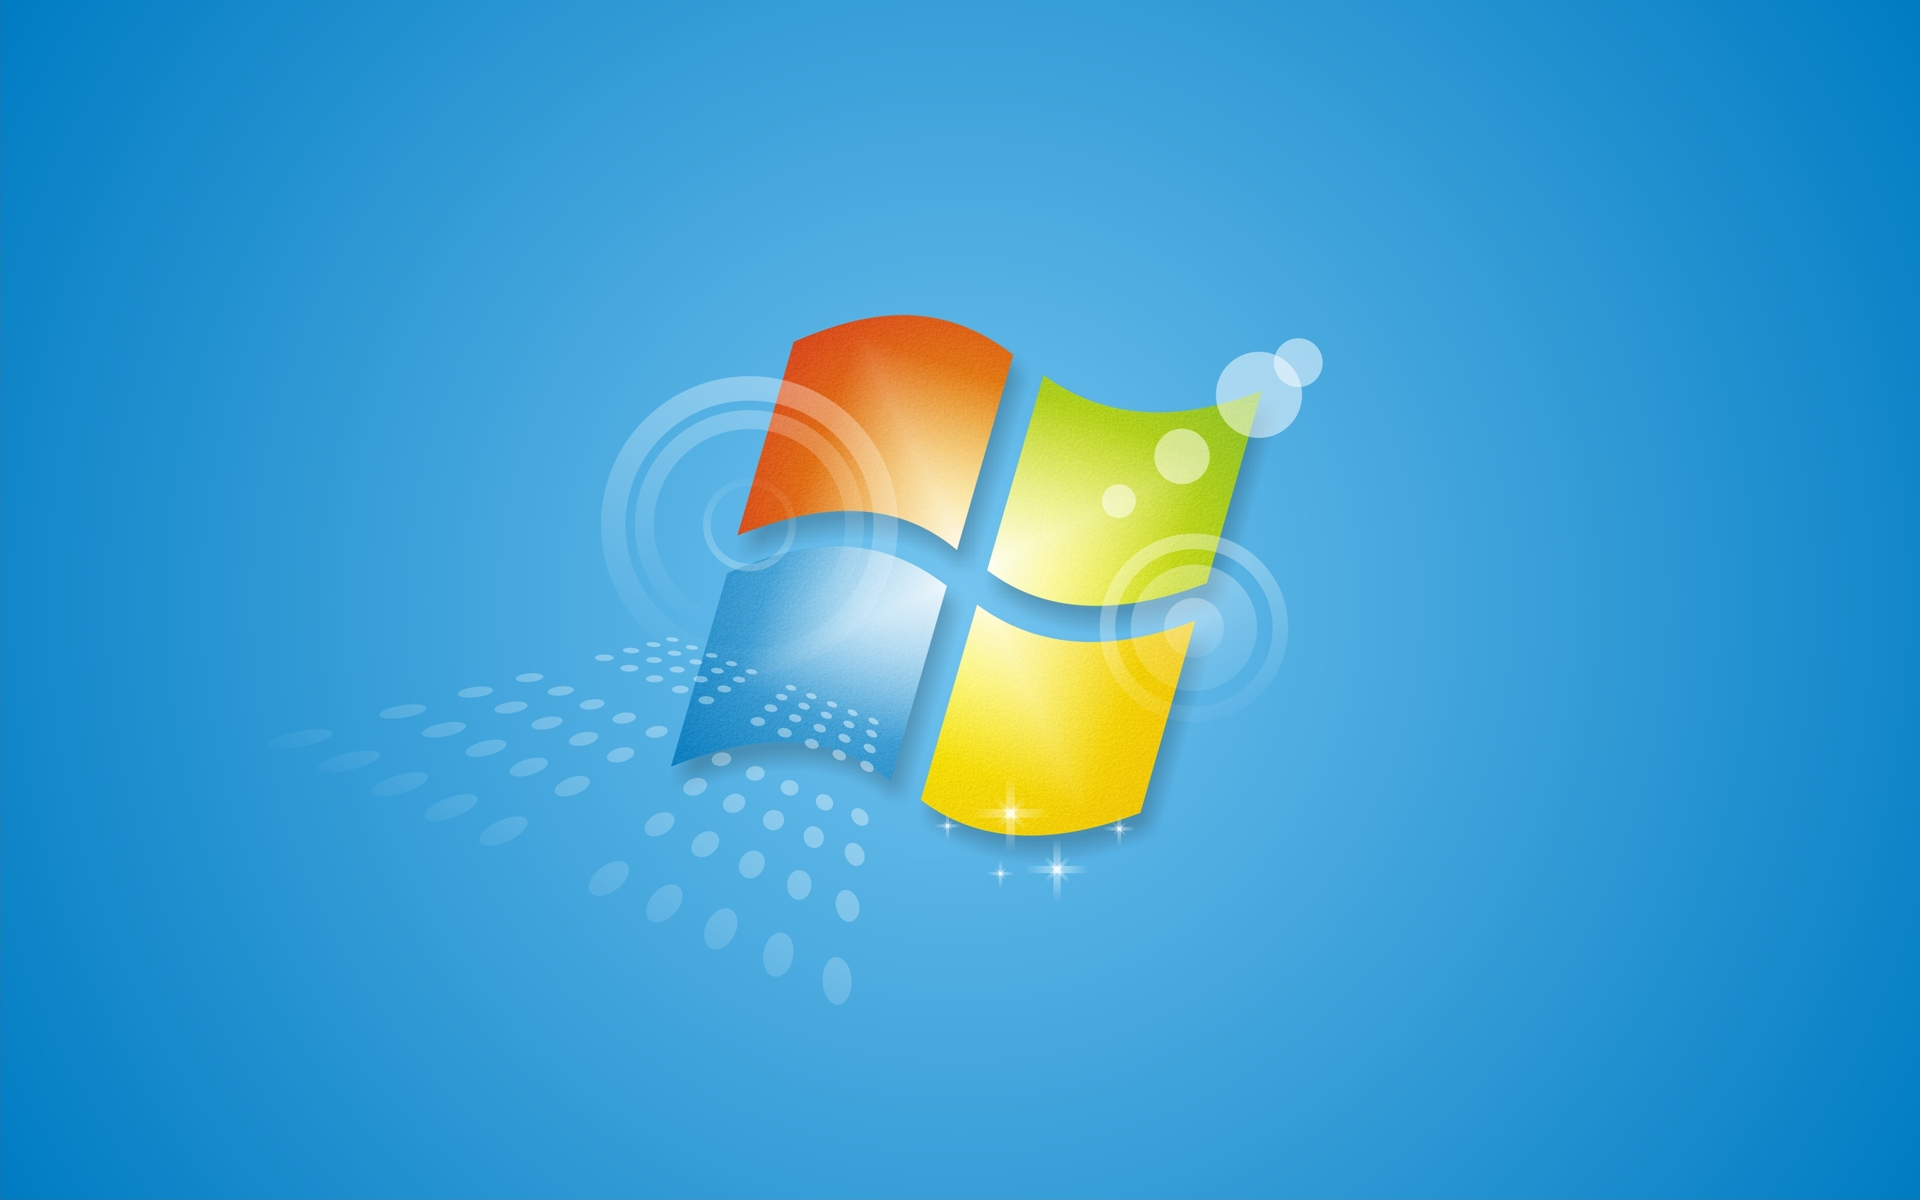 how to change desktop background in windows 7 starter